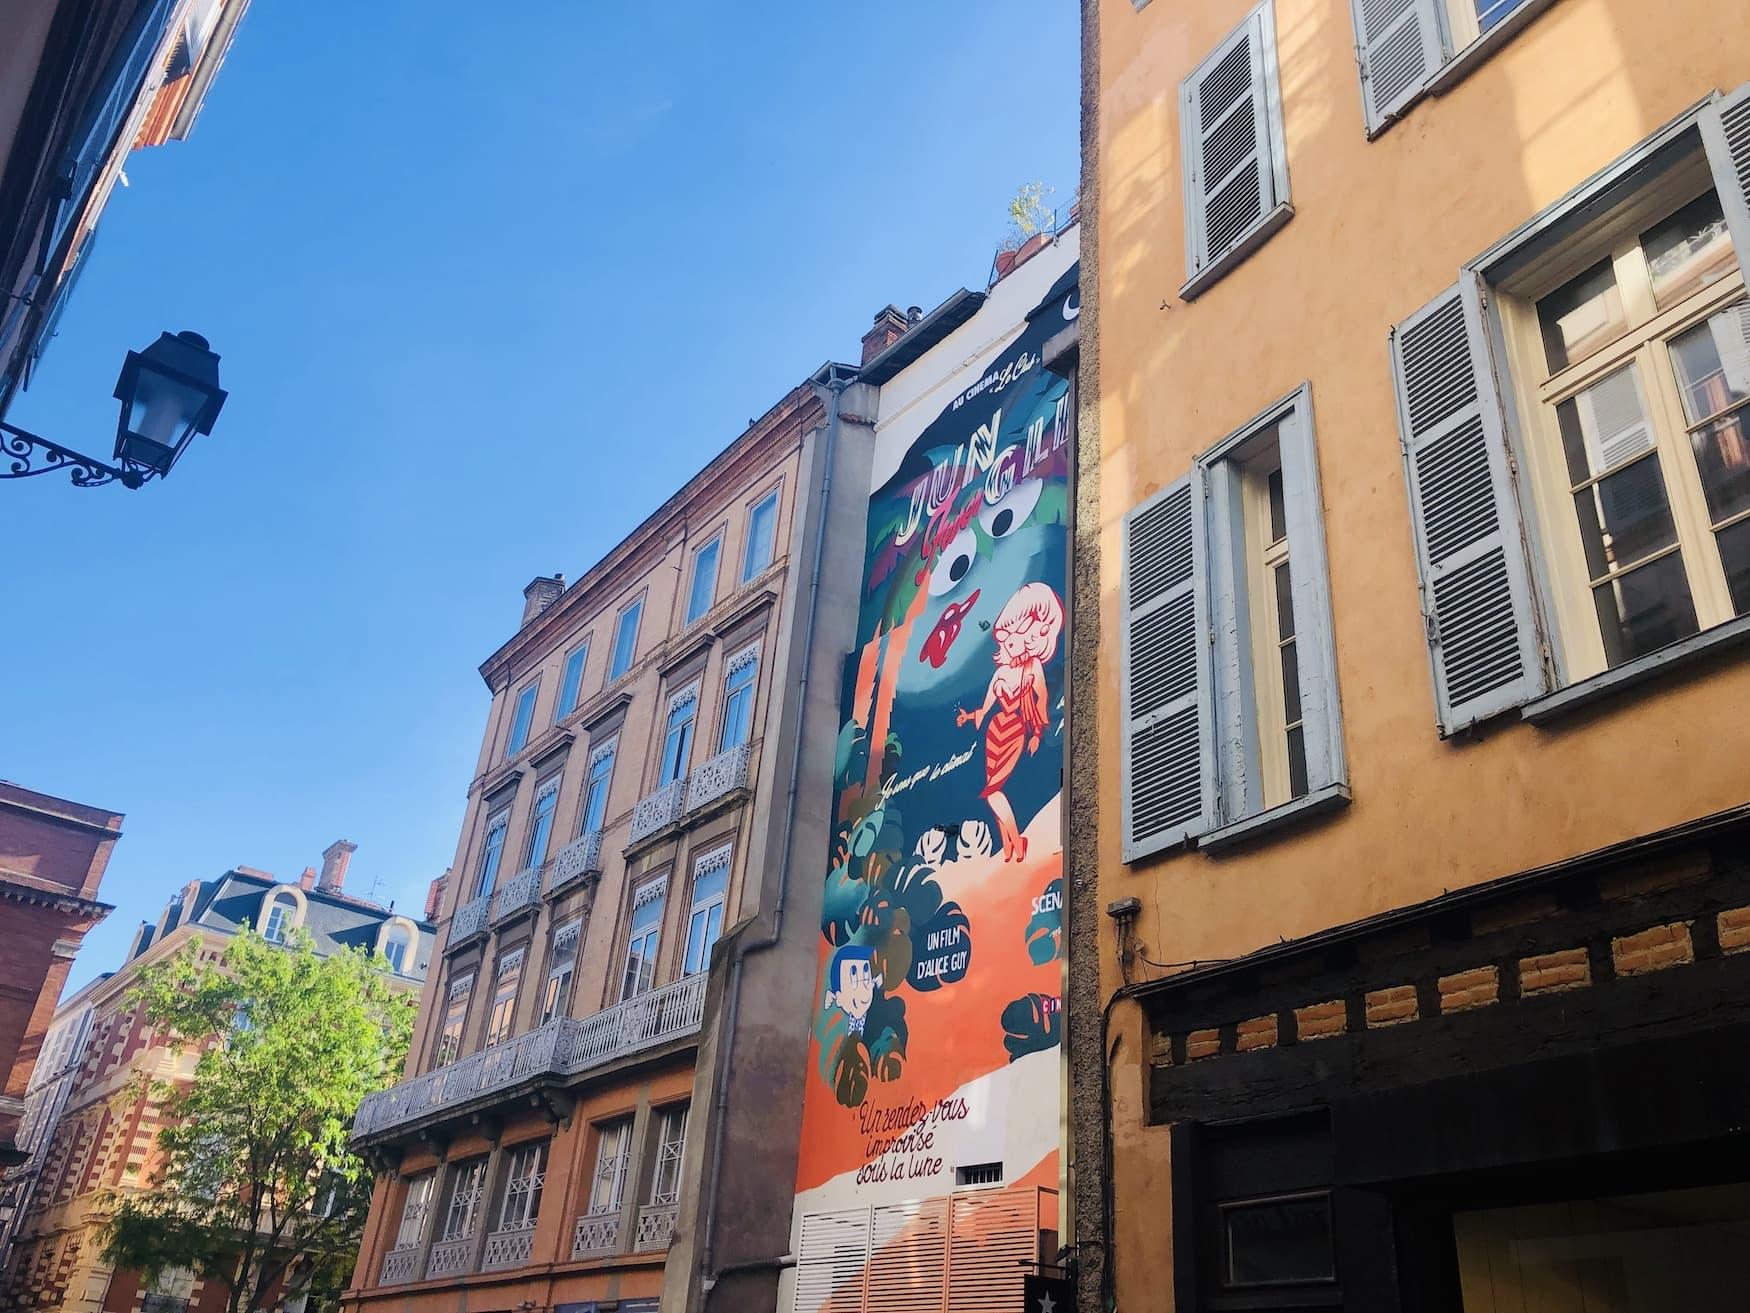 Street Art der Künstlerin Mlle Kat in Toulouse